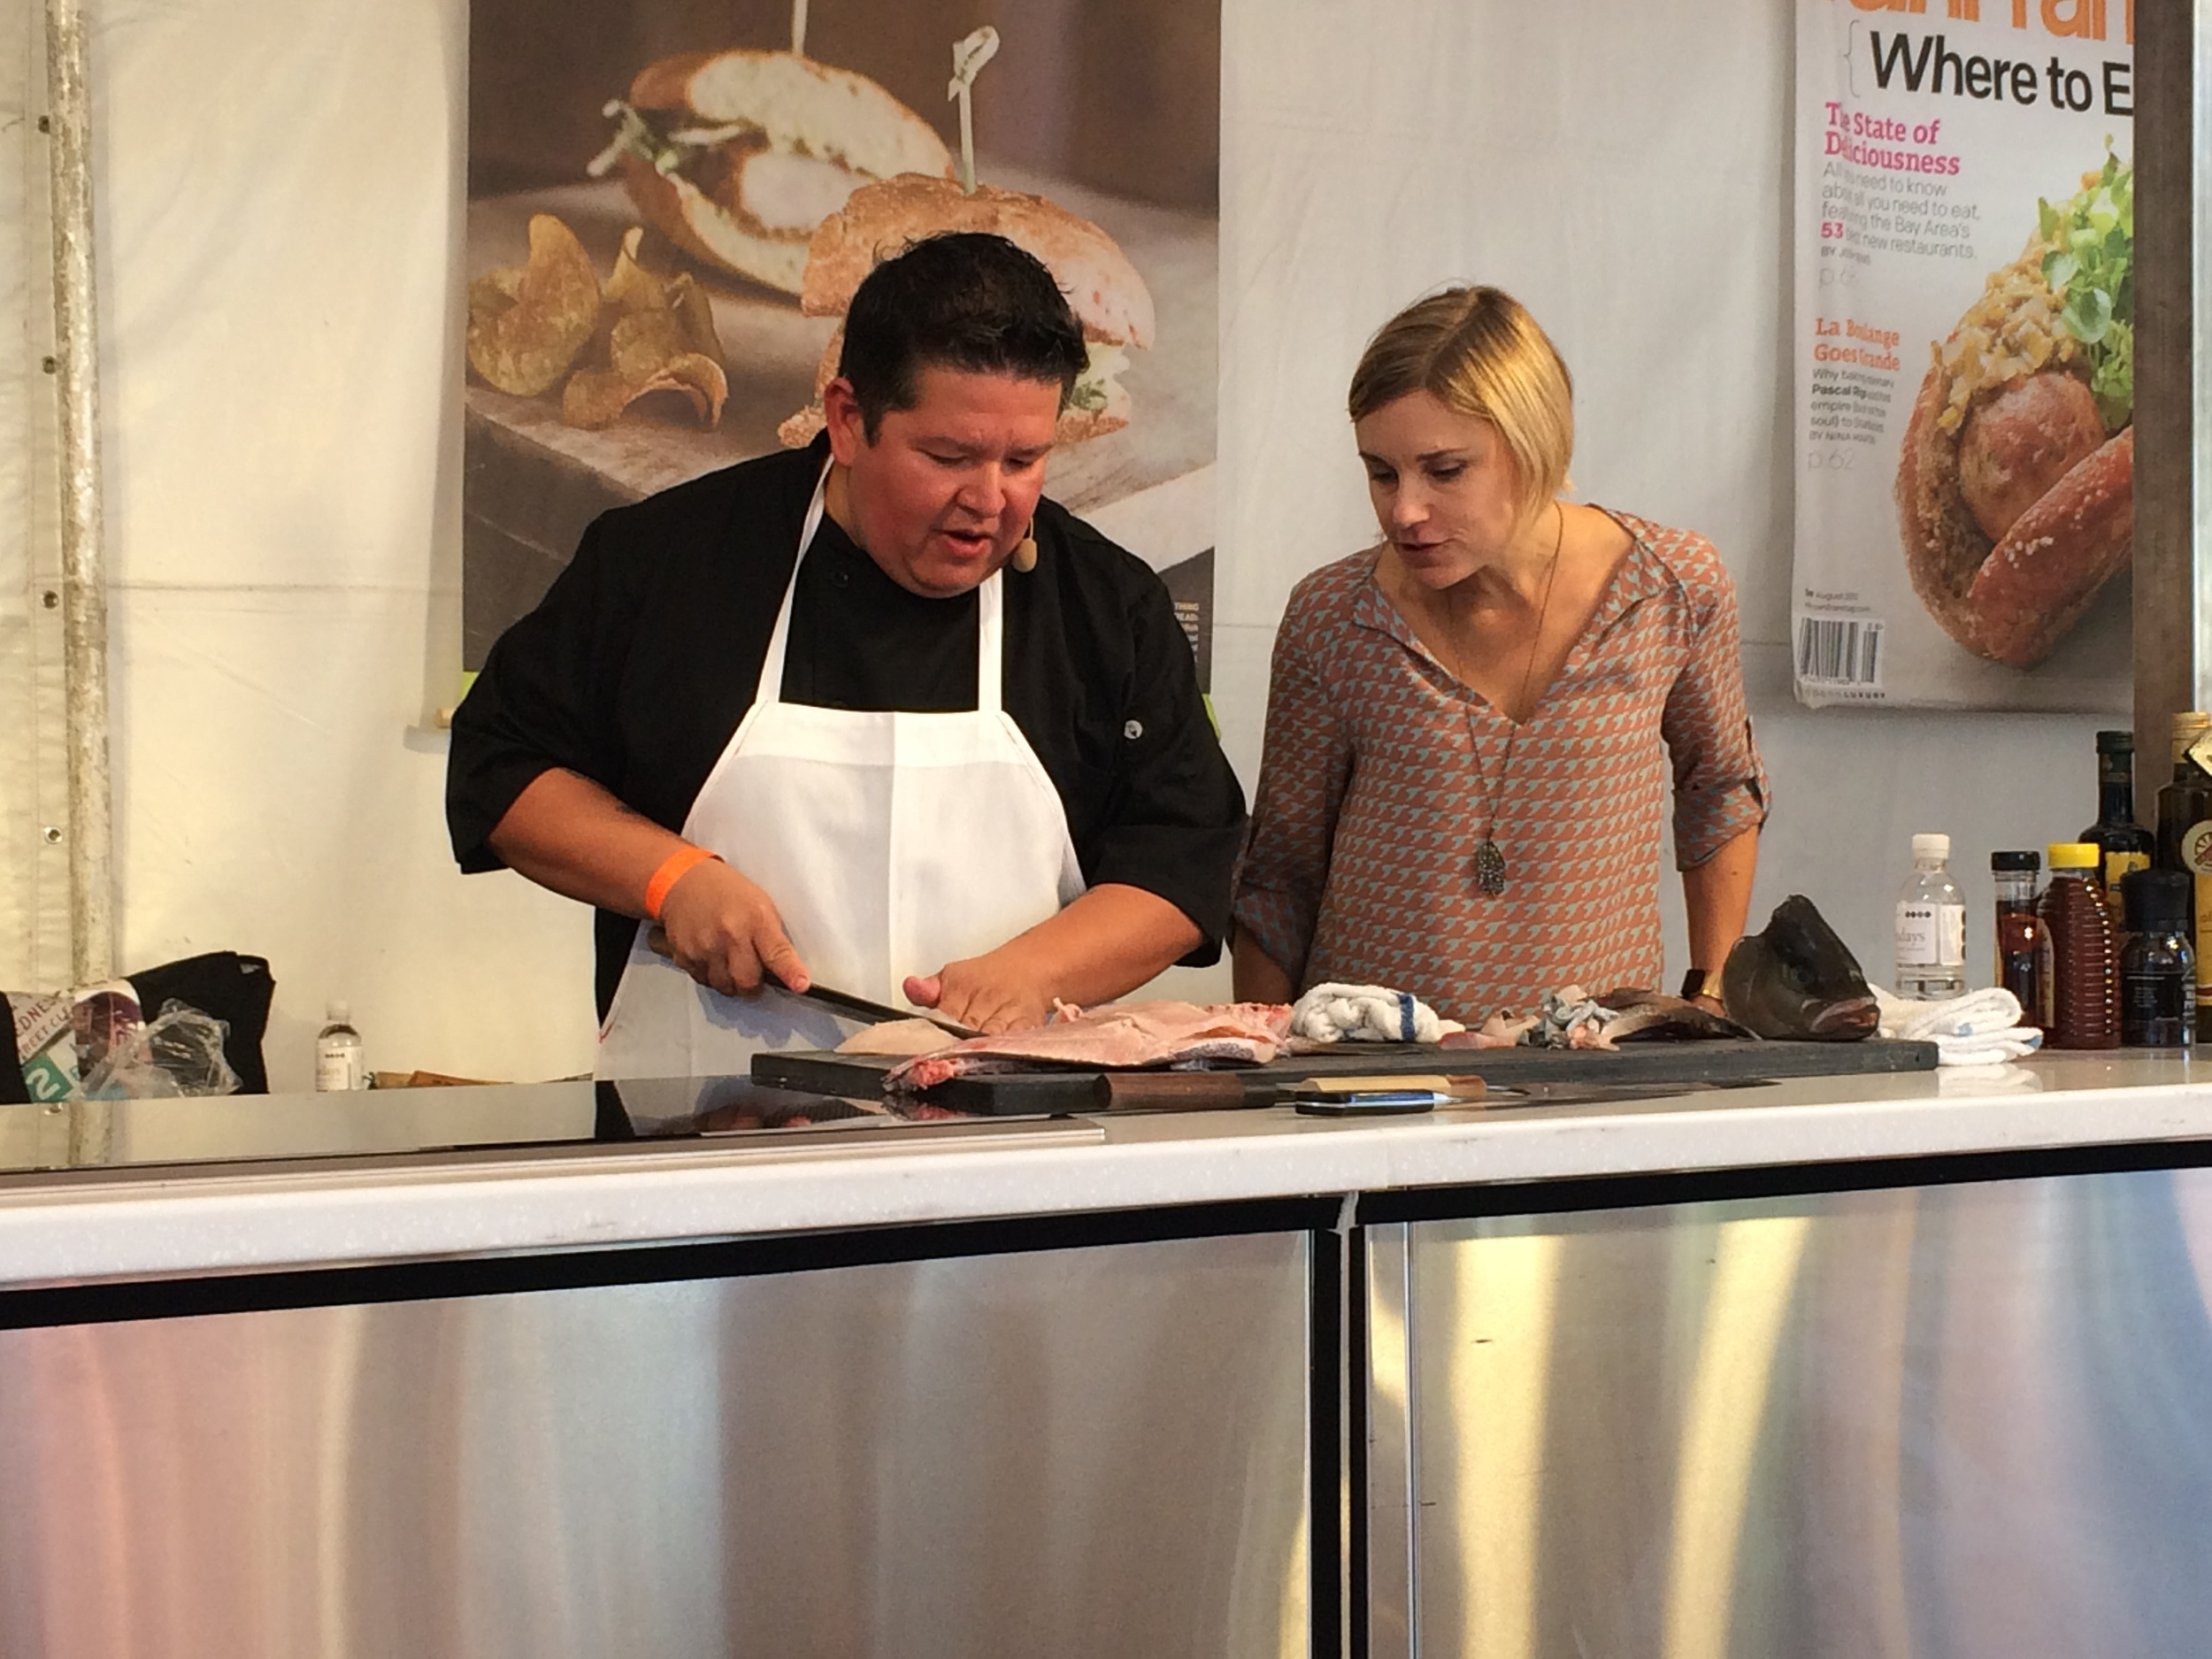 Chef Tim — San Francisco's Top Chefs Demonstration: Kona Kampachi Butchery and Sashimi, at  San Francisco   magazine's FallFest